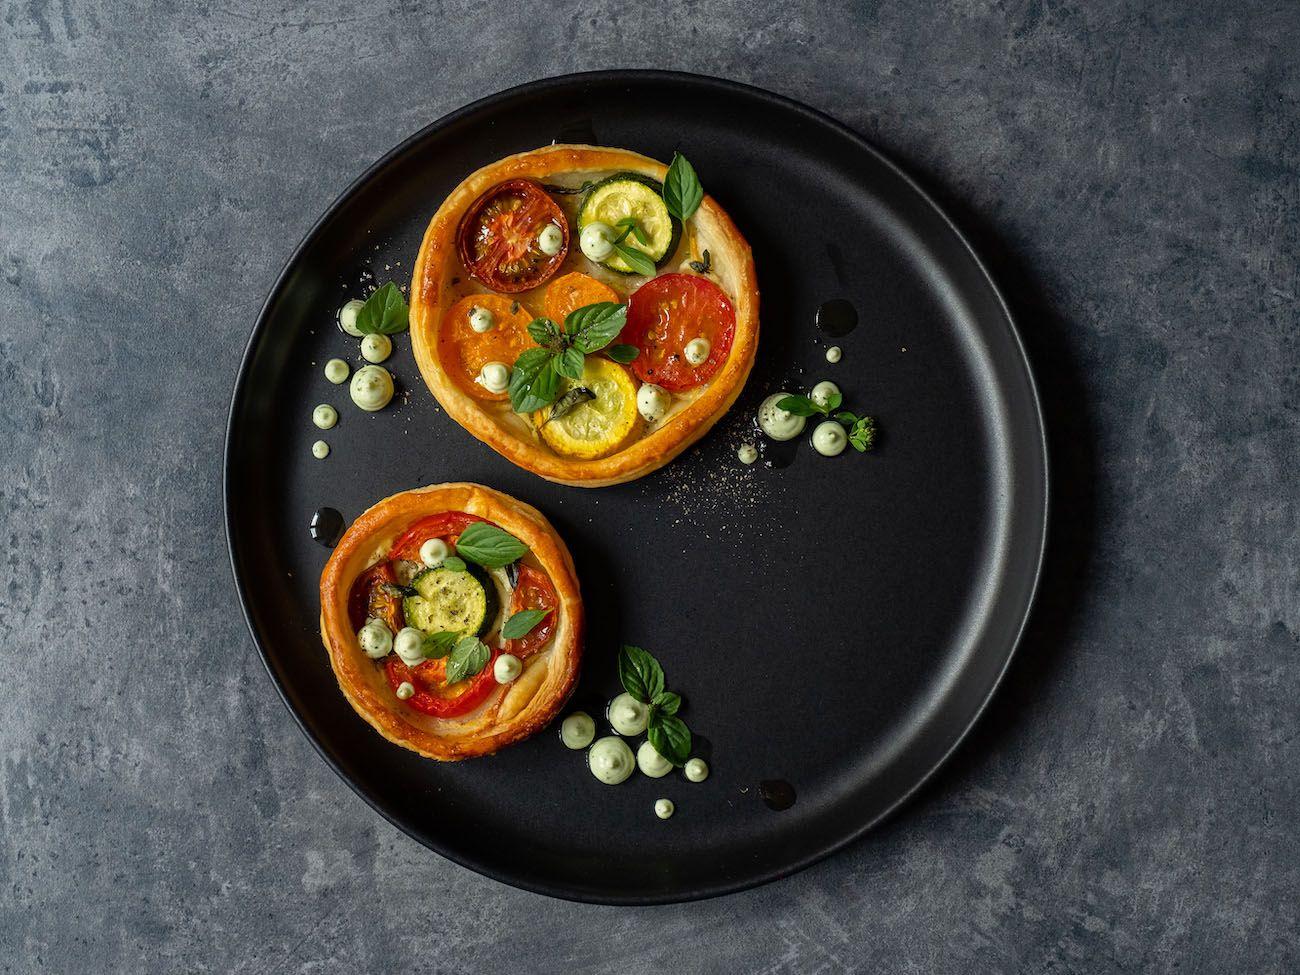 Rezept, Foodblog, About Fuel, Tomaten Zucchini Tartelettes mit Basilikum Feta Creme, Teller, Pfeffer, Oregano